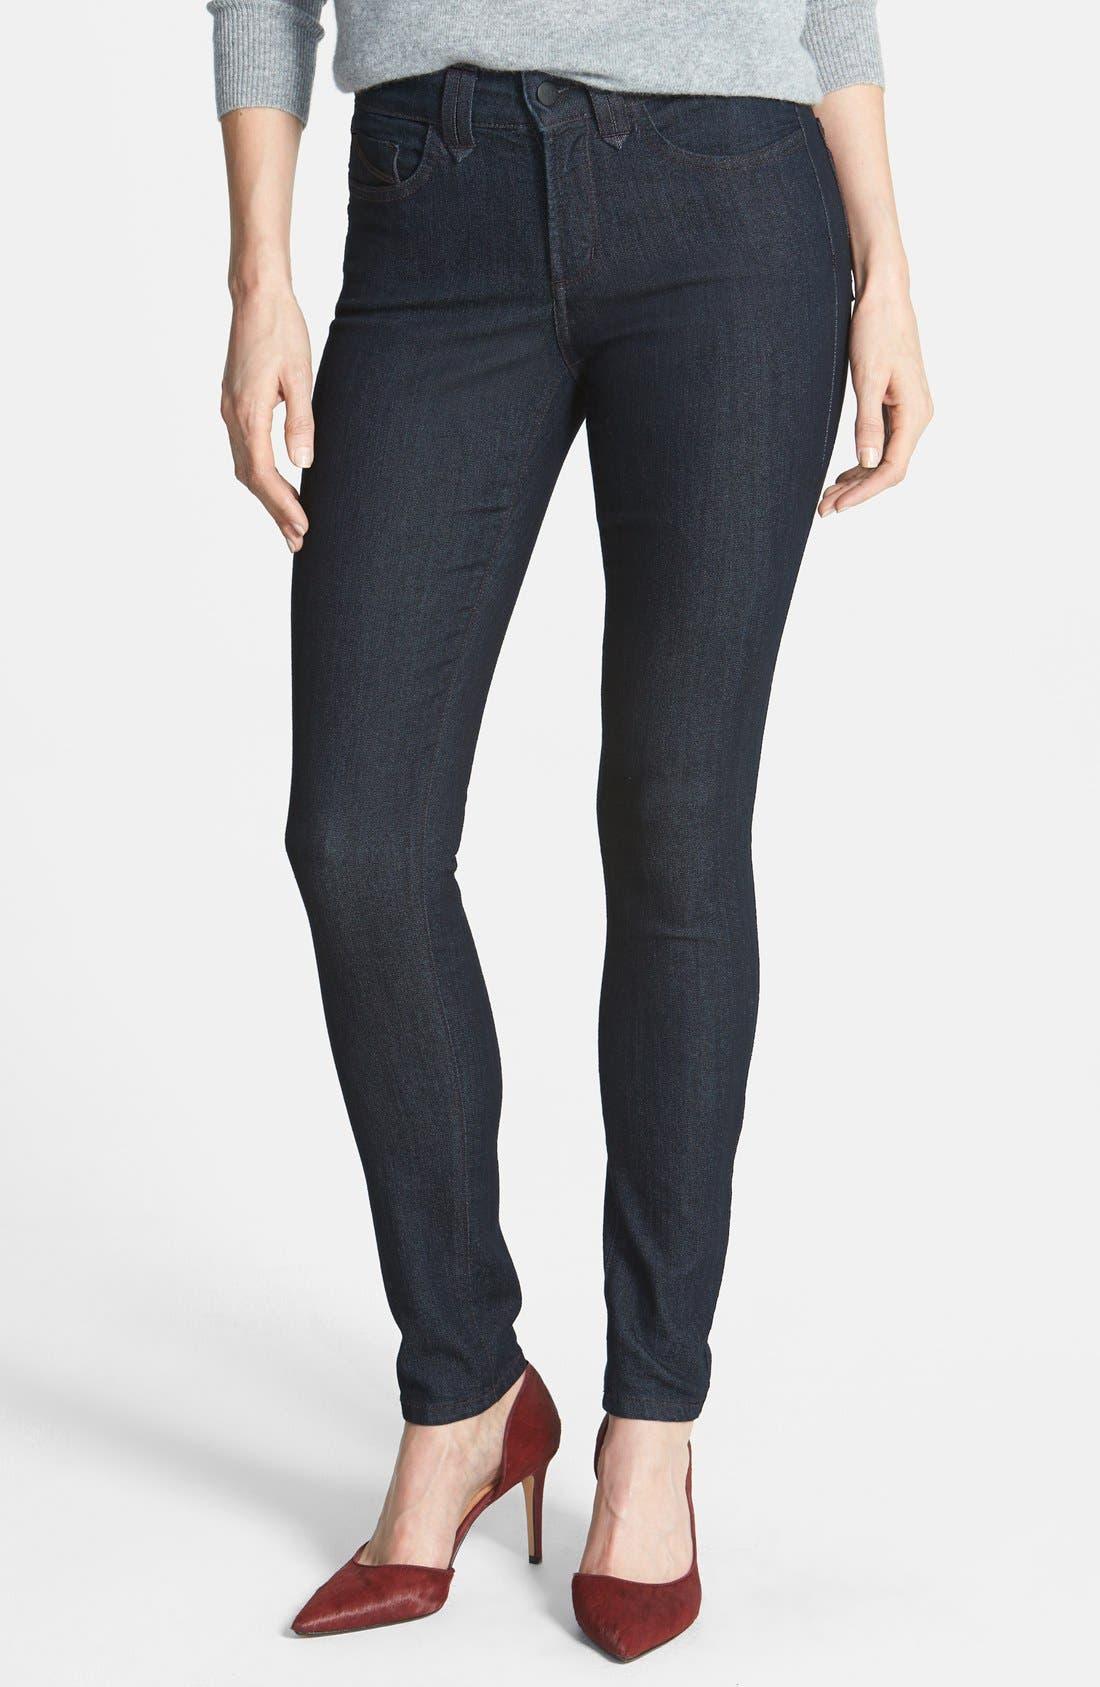 Alternate Image 1 Selected - NYDJ 'Ami' Contrast Stitch Stretch Skinny Jeans (Dark Enzyme)